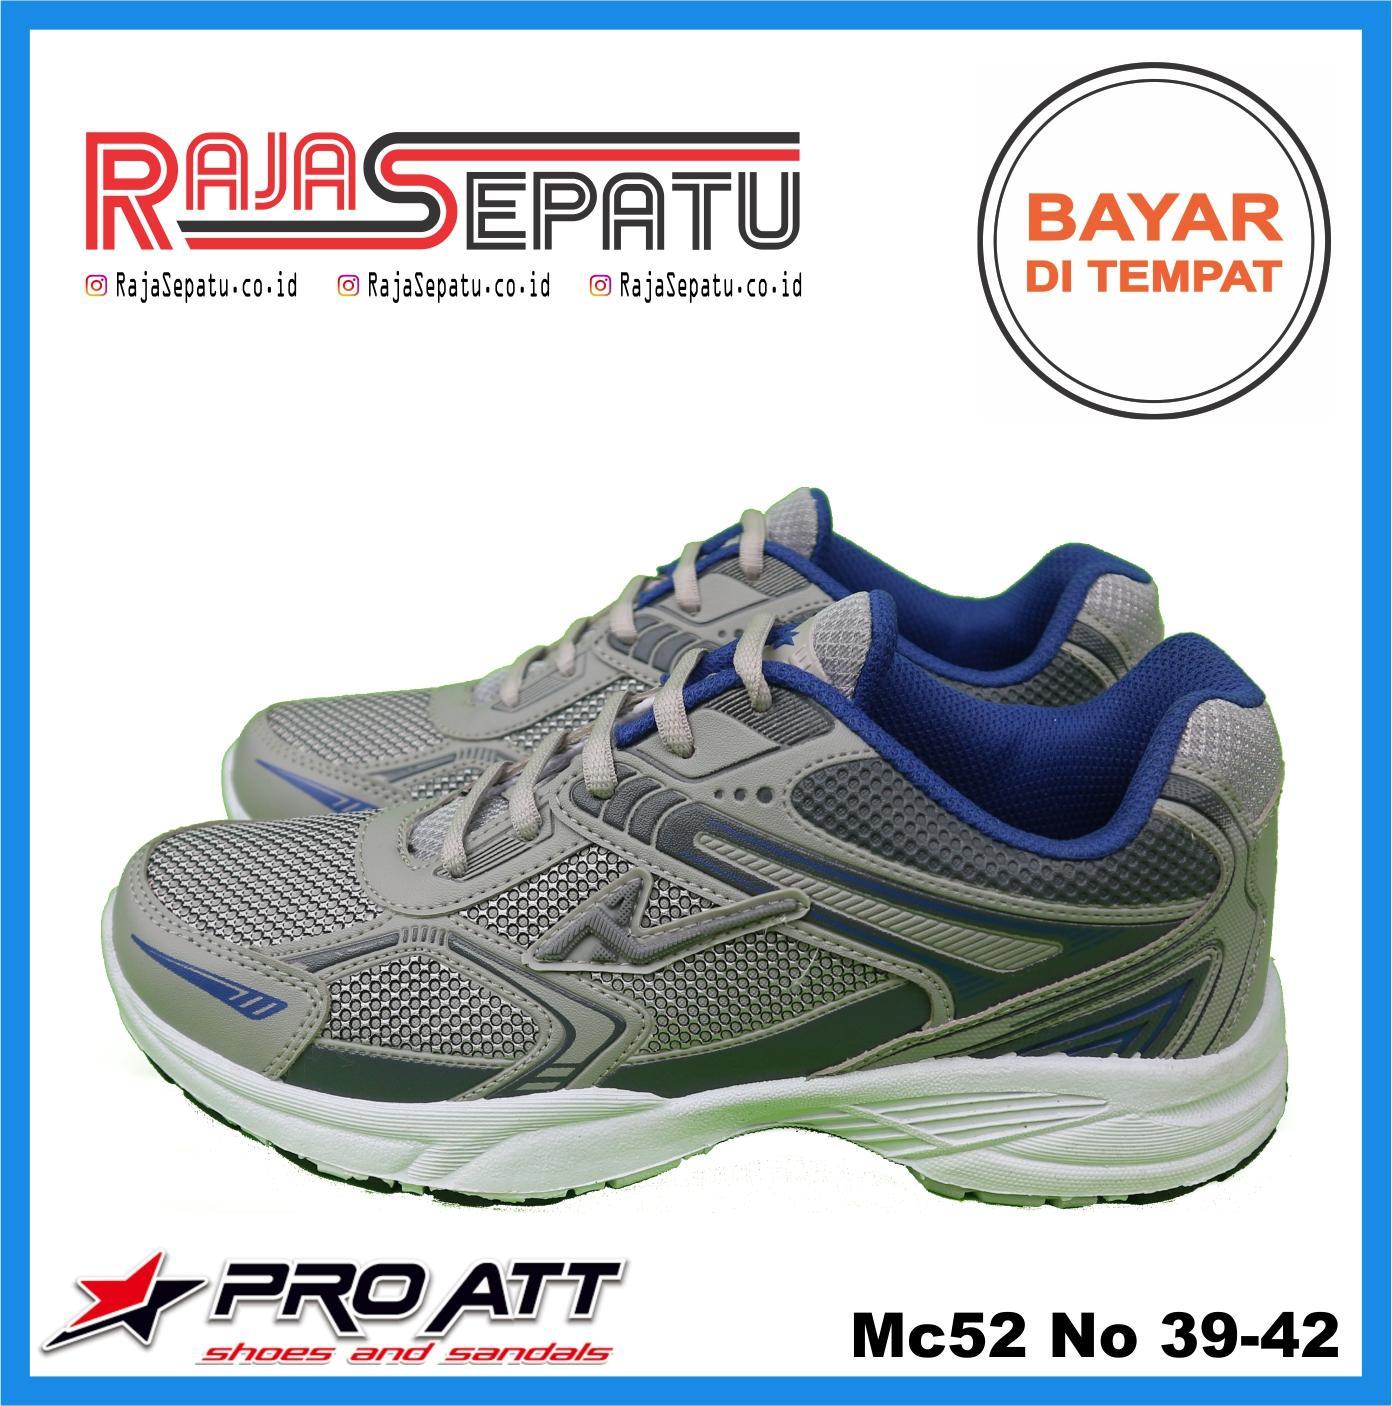 Pro ATT. Sneakers. Sneakers. Sneakers. Sneakers. Sepatu ... e47a8c53c7